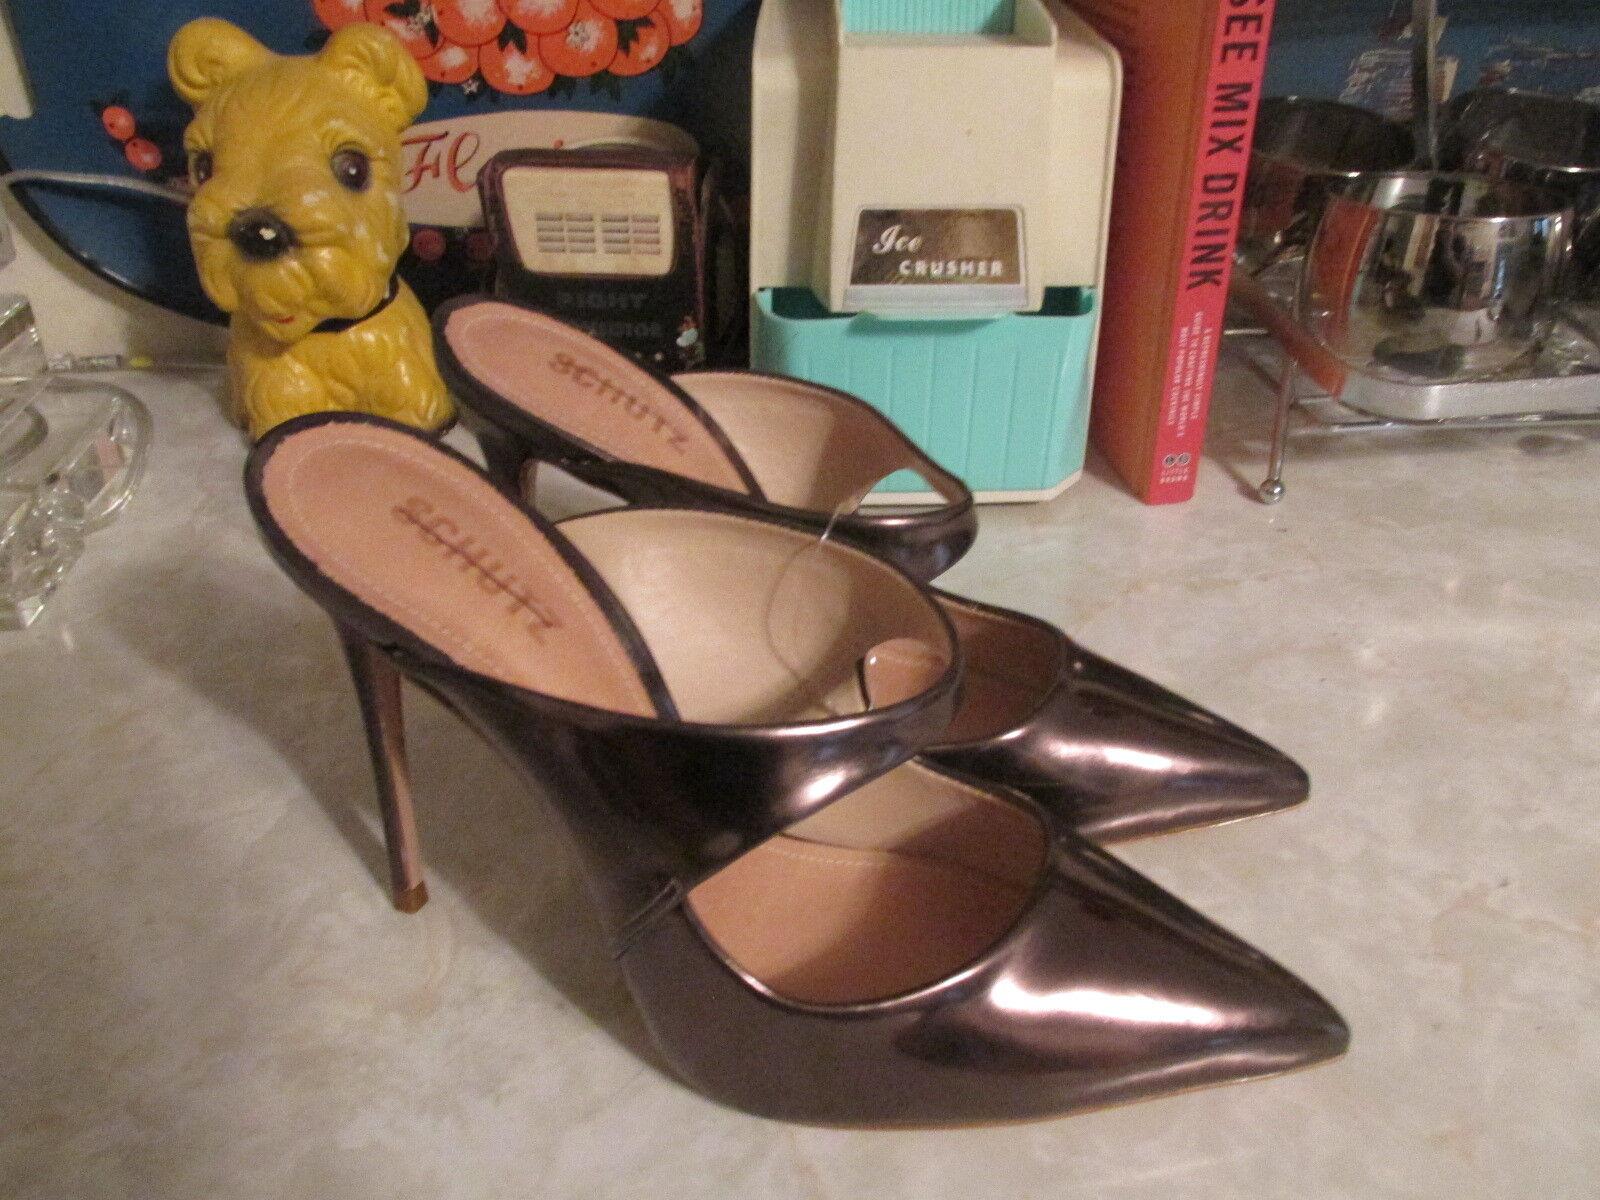 Schutz Nicolly Pointy 8.5 Toe Mule Heels Patent Leder Größe: 8.5 Pointy B NWOB 5581ad